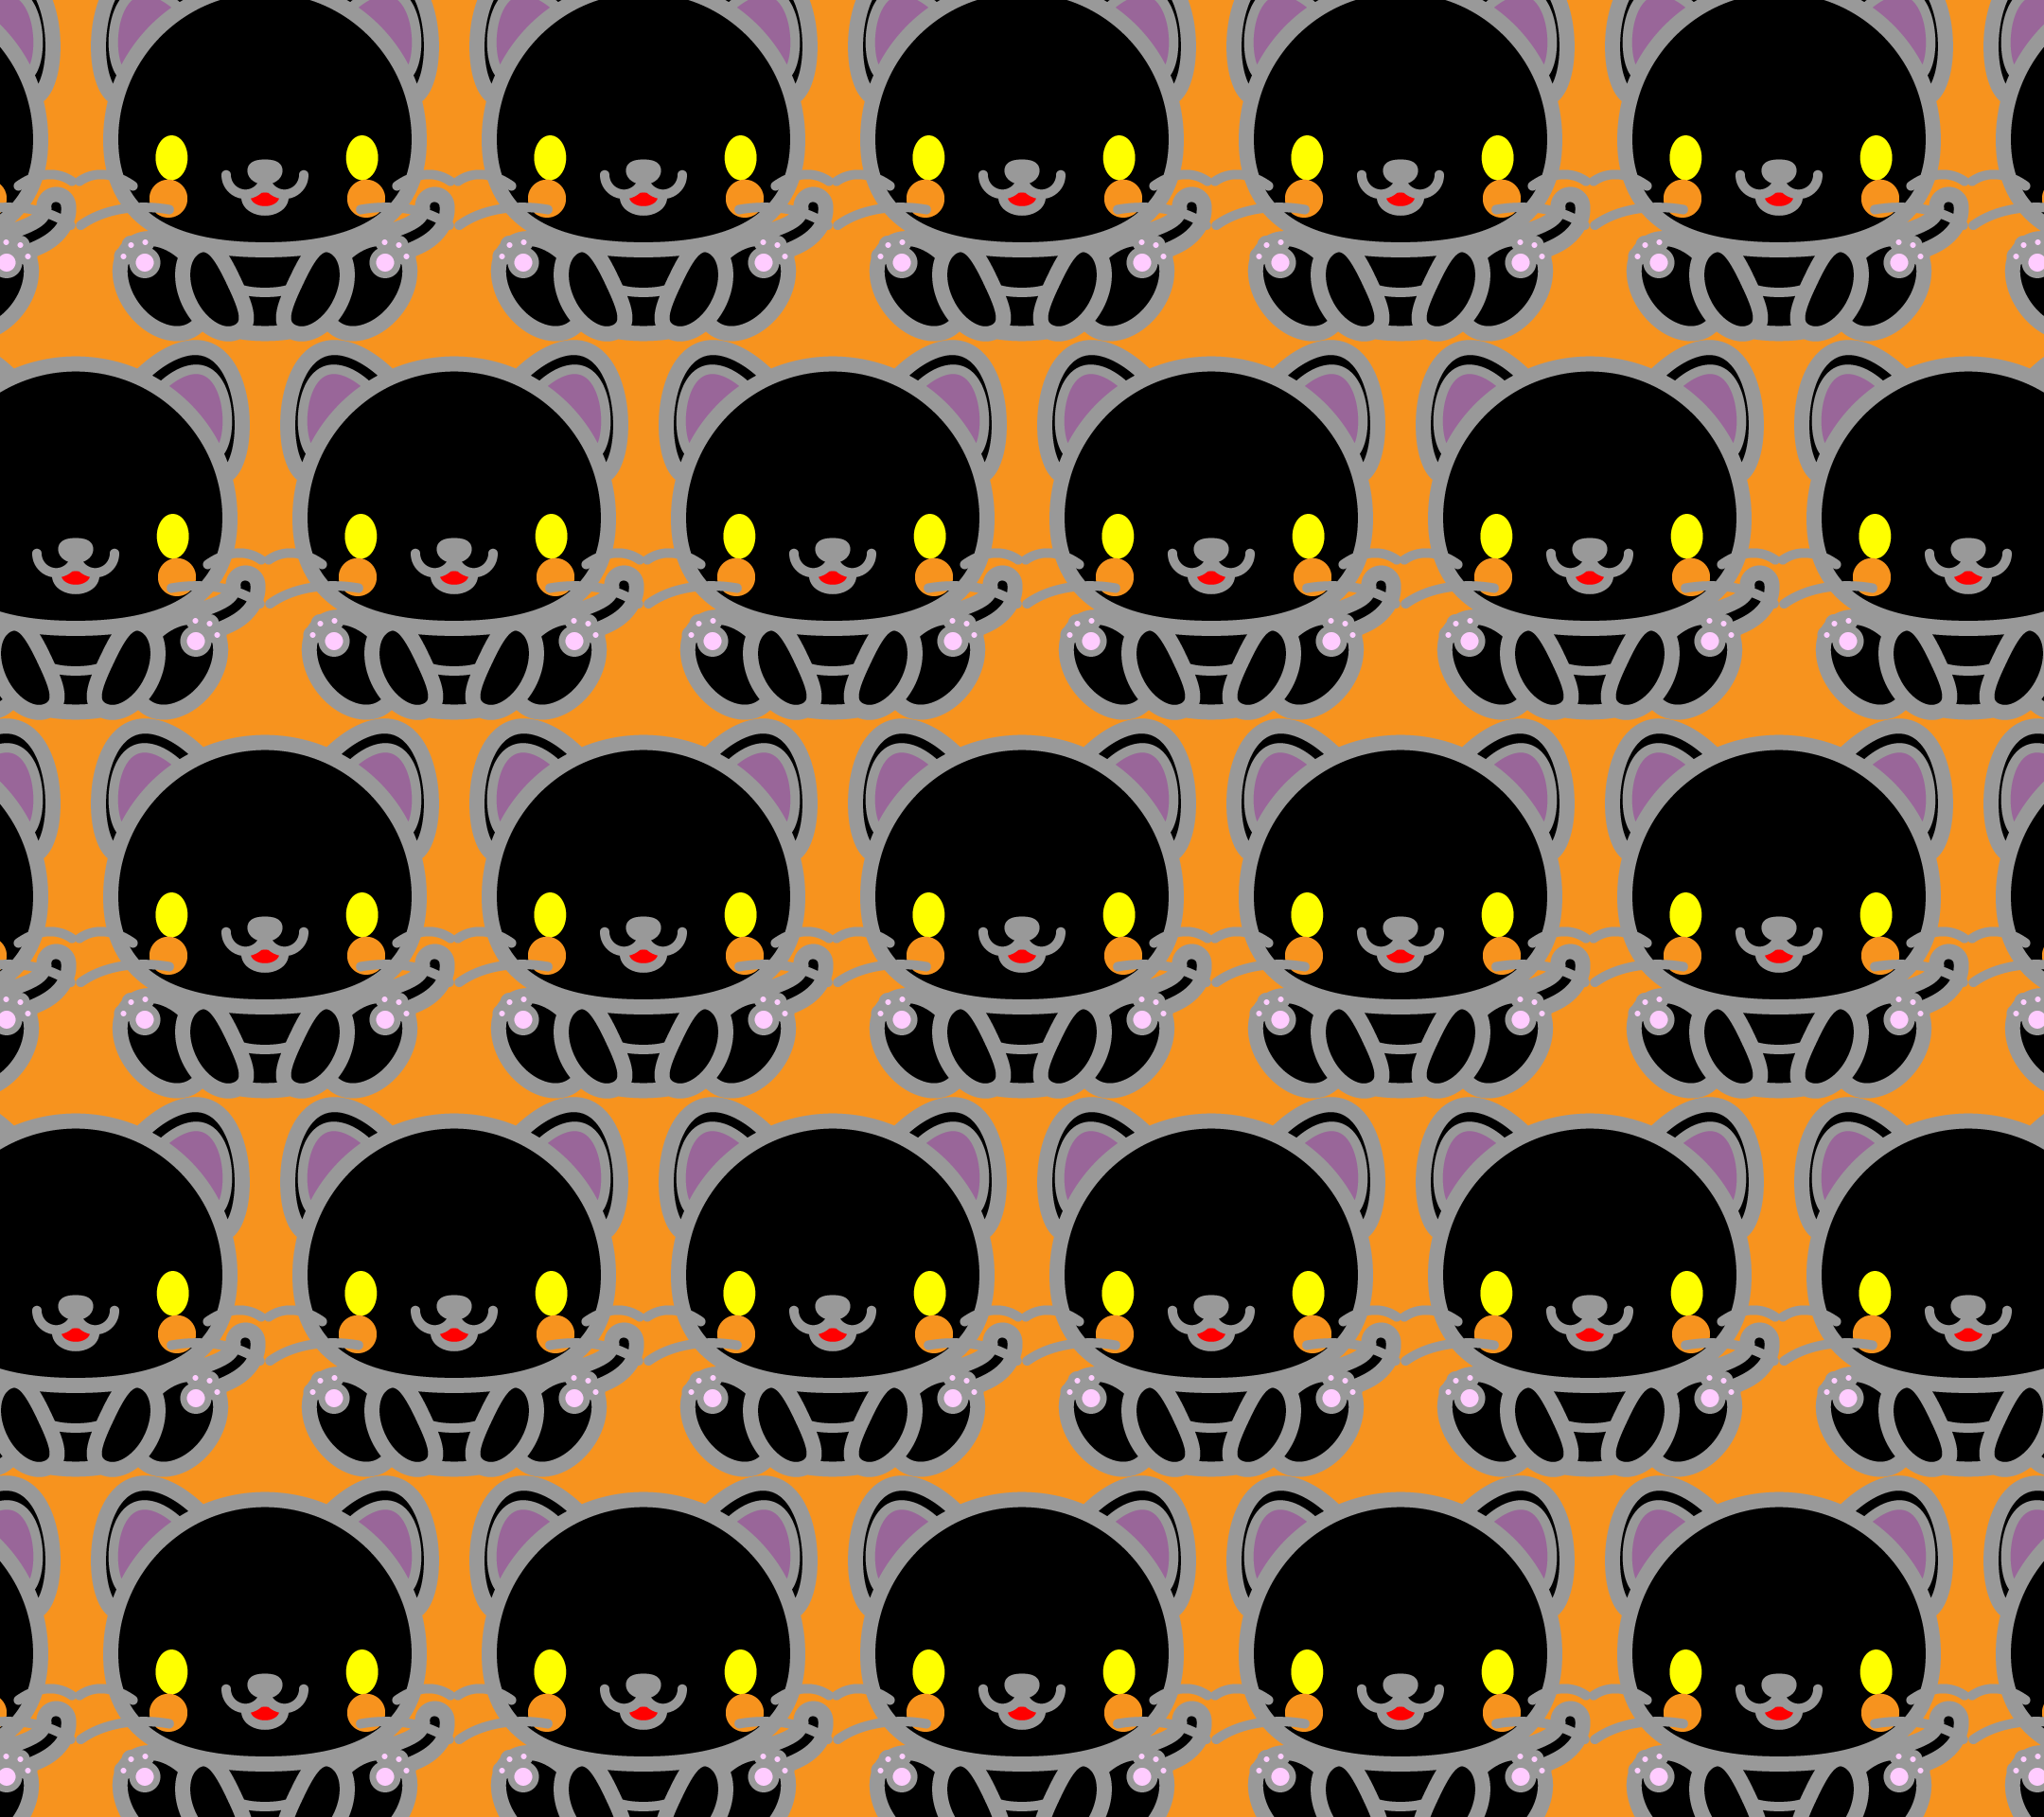 wallpaper3_sitblackcat-fiill-orange-android